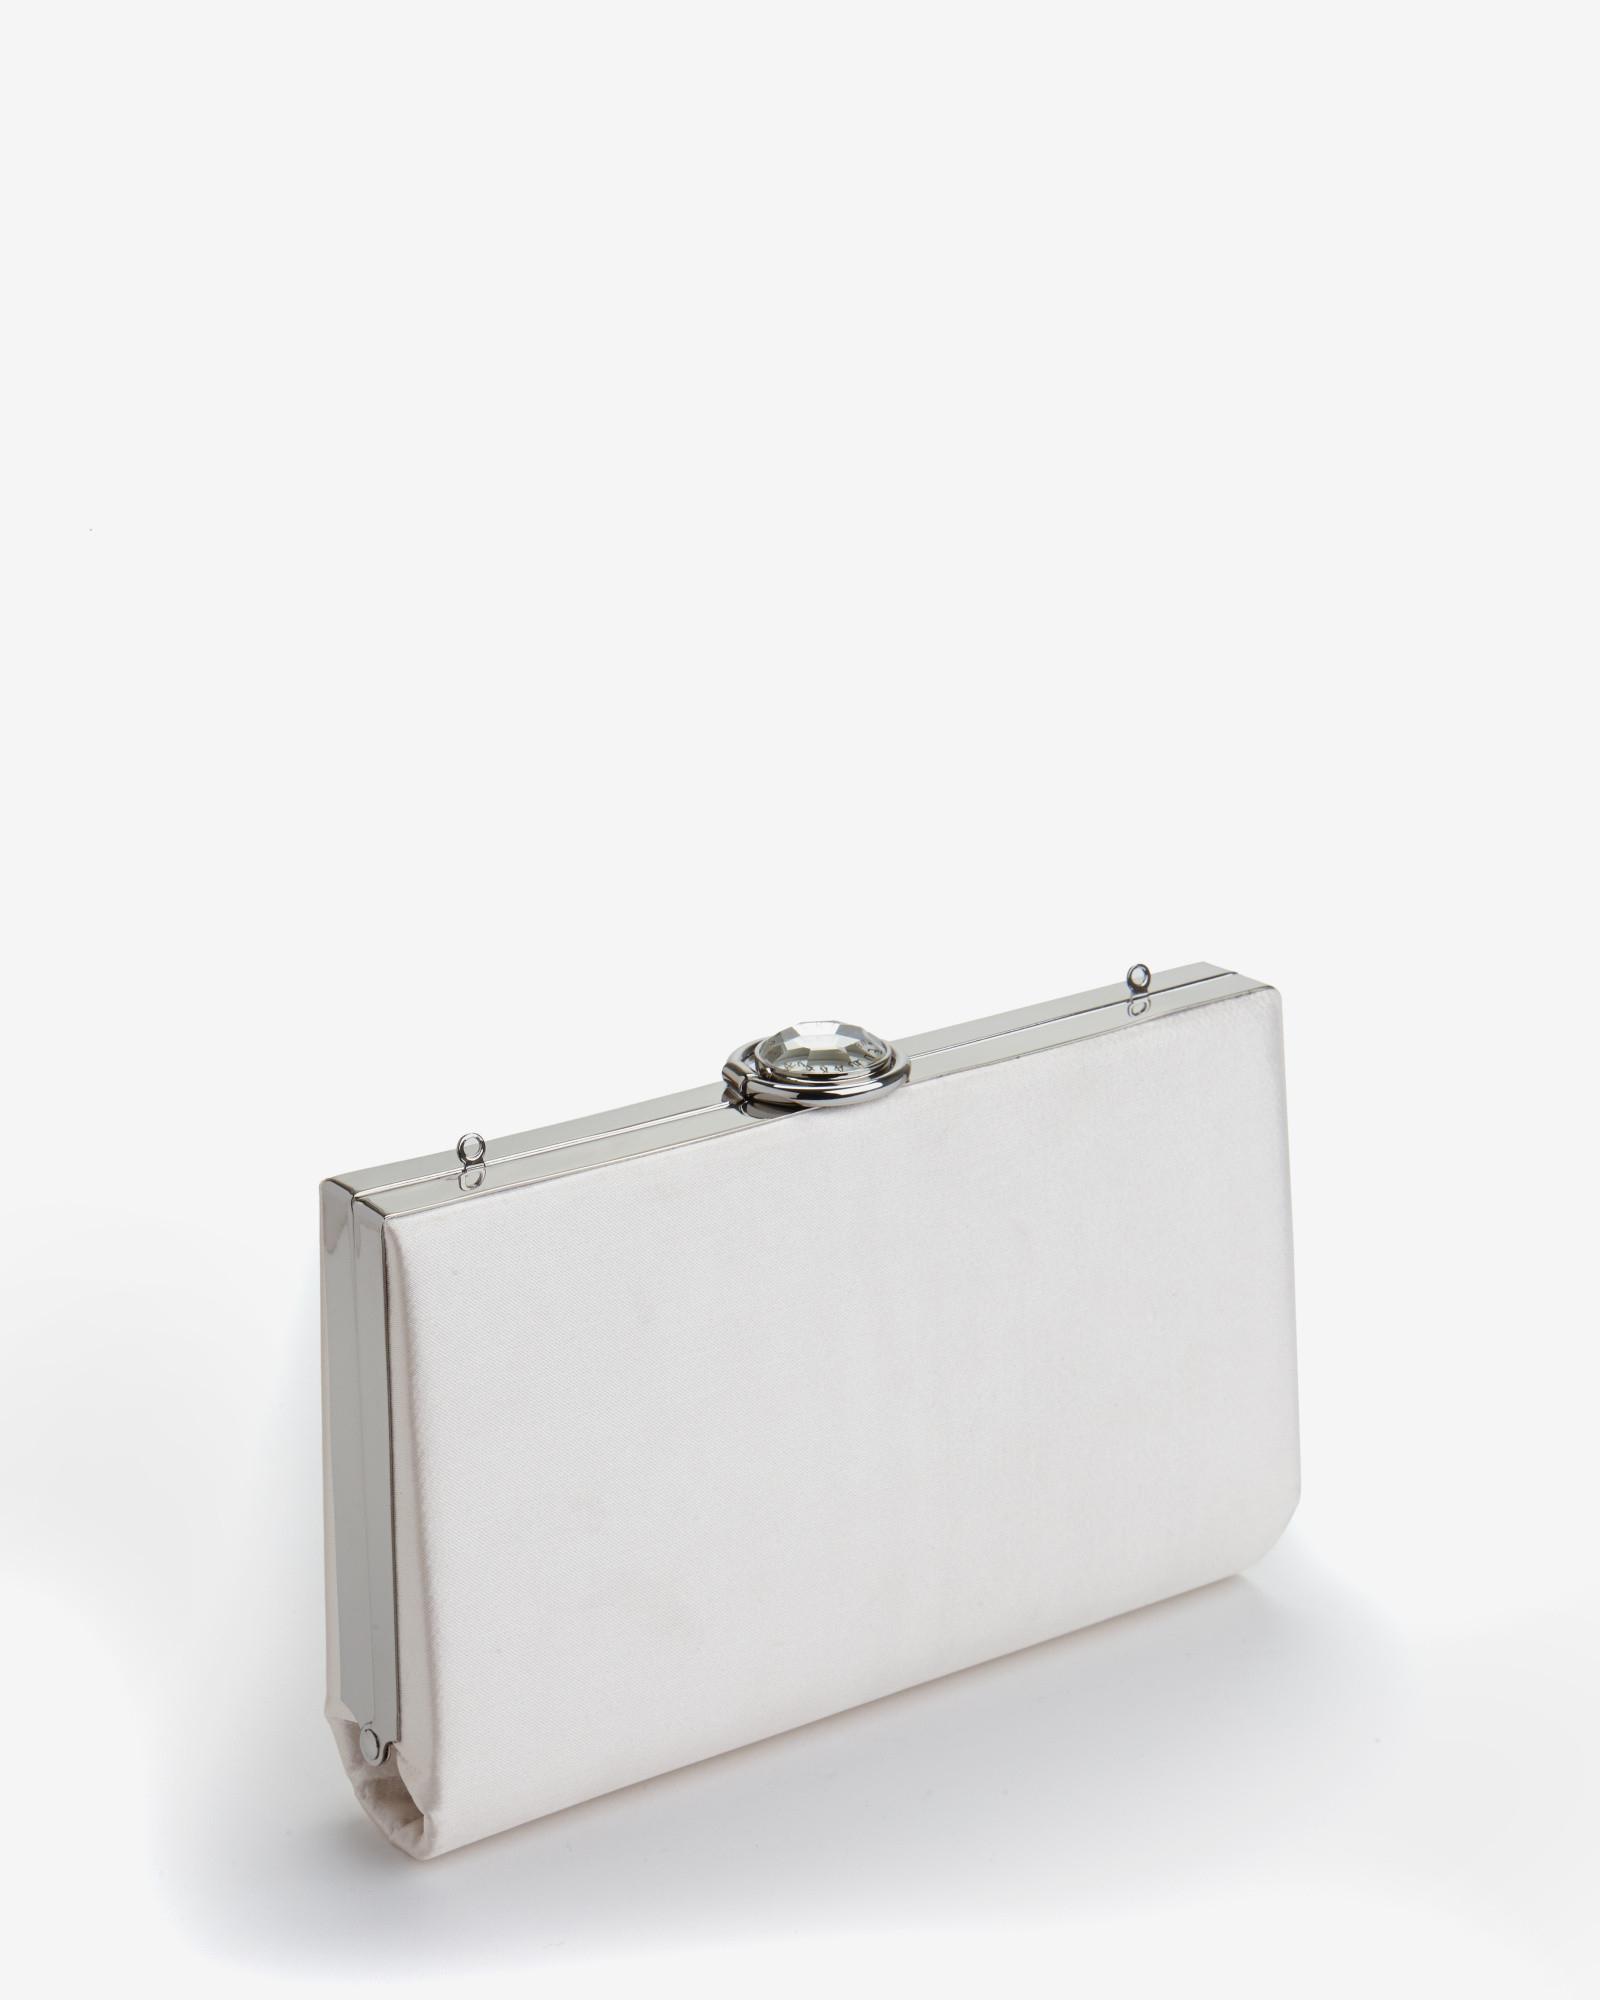 Lyst - Ted Baker Embellished Hard Case Clutch Bag in Gray c4b2b4eeb